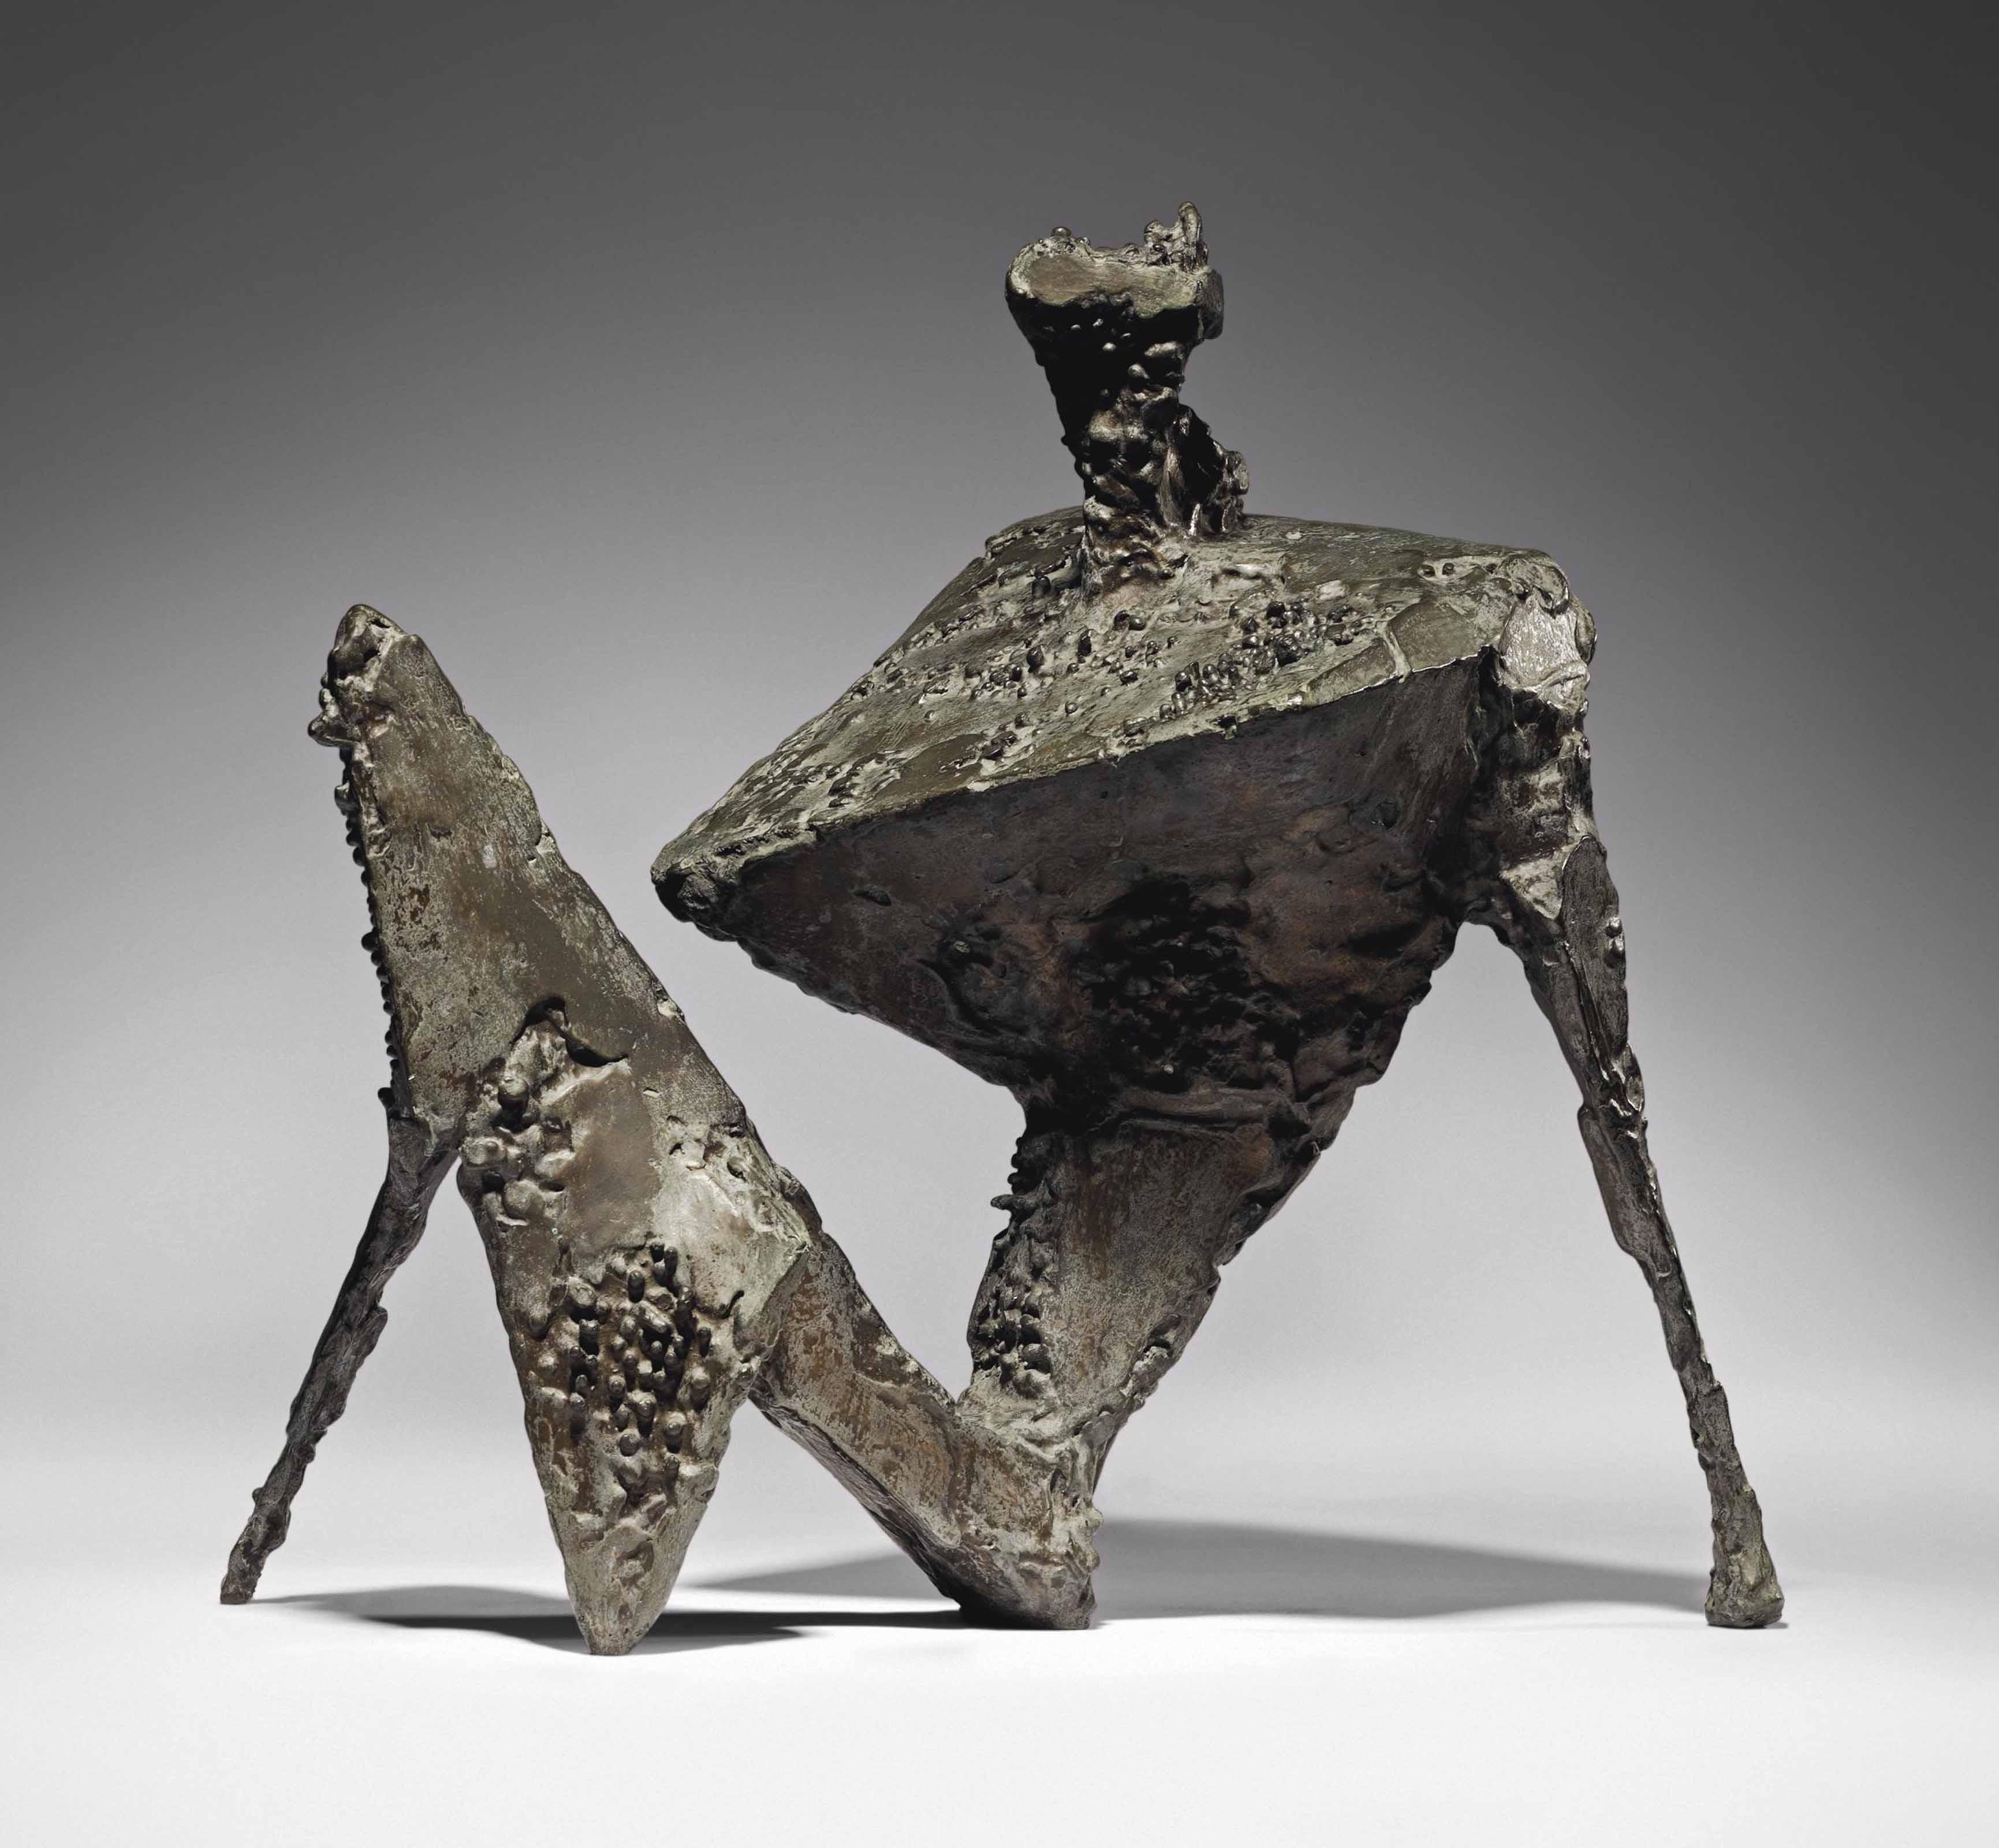 Sitting-up Figure